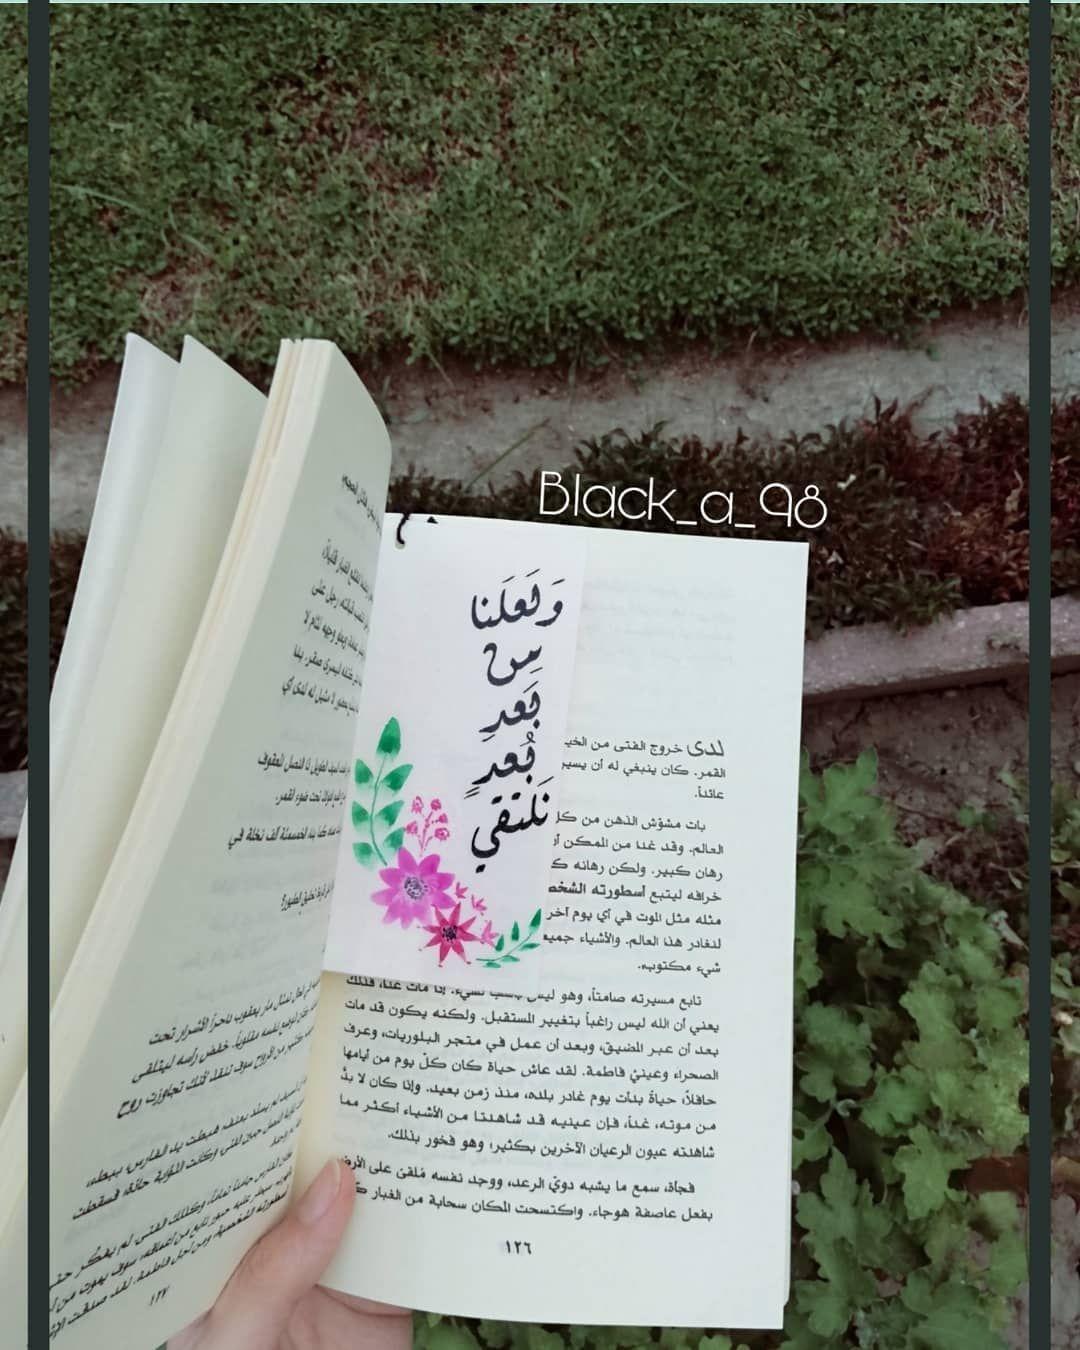 فواصل كتب فواصل كتاب فواصل كتب فواصل هدايا هديه هدايا فخمه صور كتب Calligraphy Giftideas Gift Art Artwork B Bullet Journal